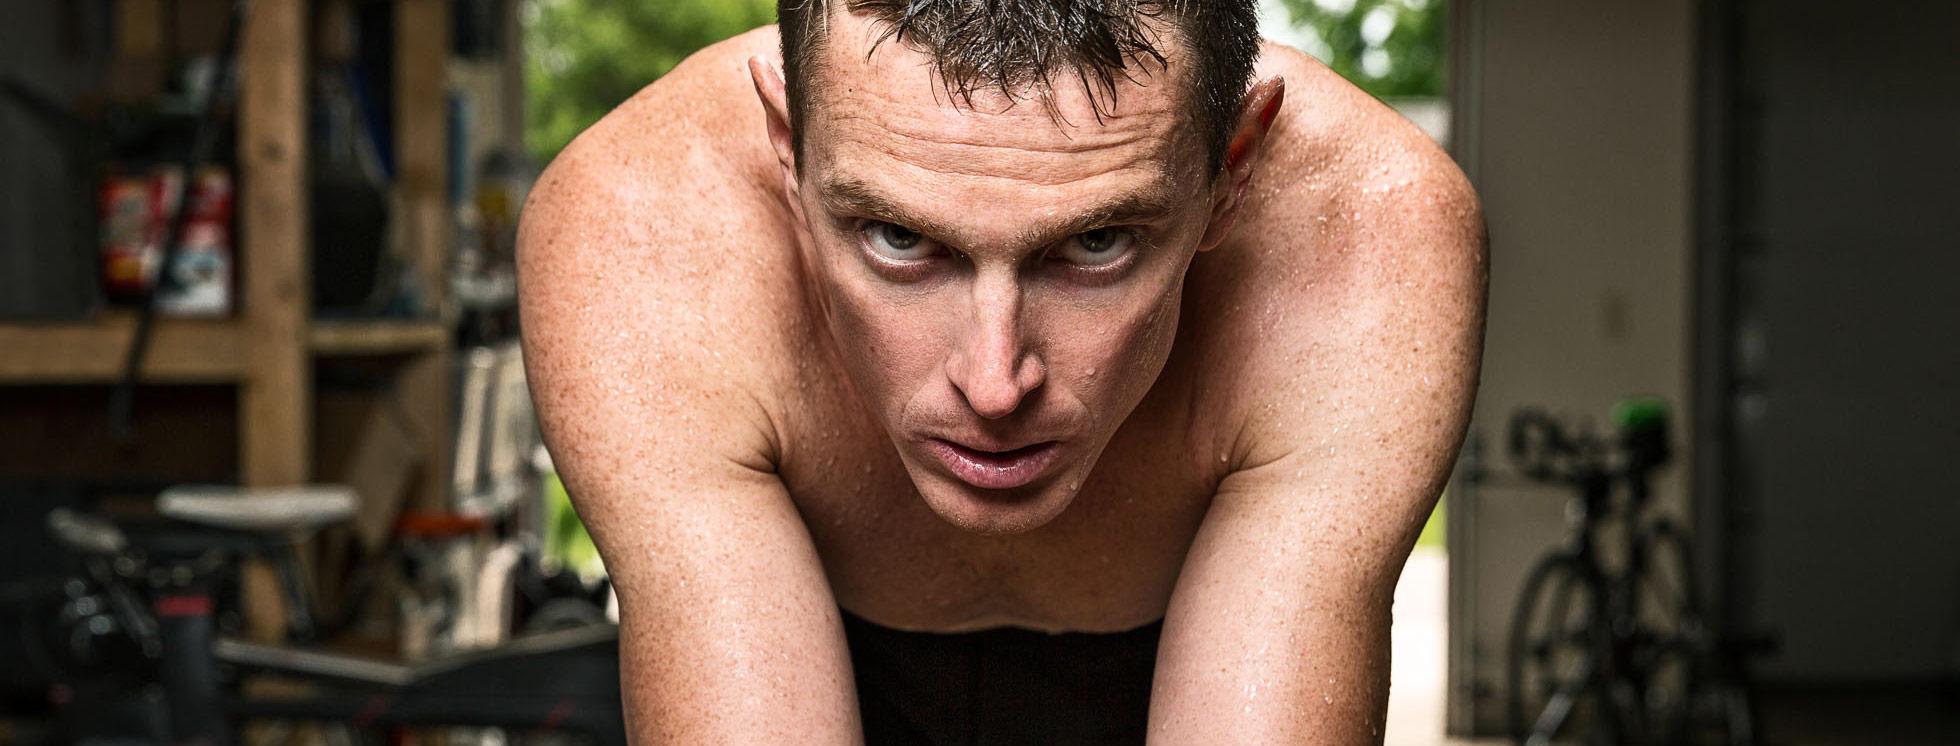 Behind the Scenes: Matt Hanson for NormaTec